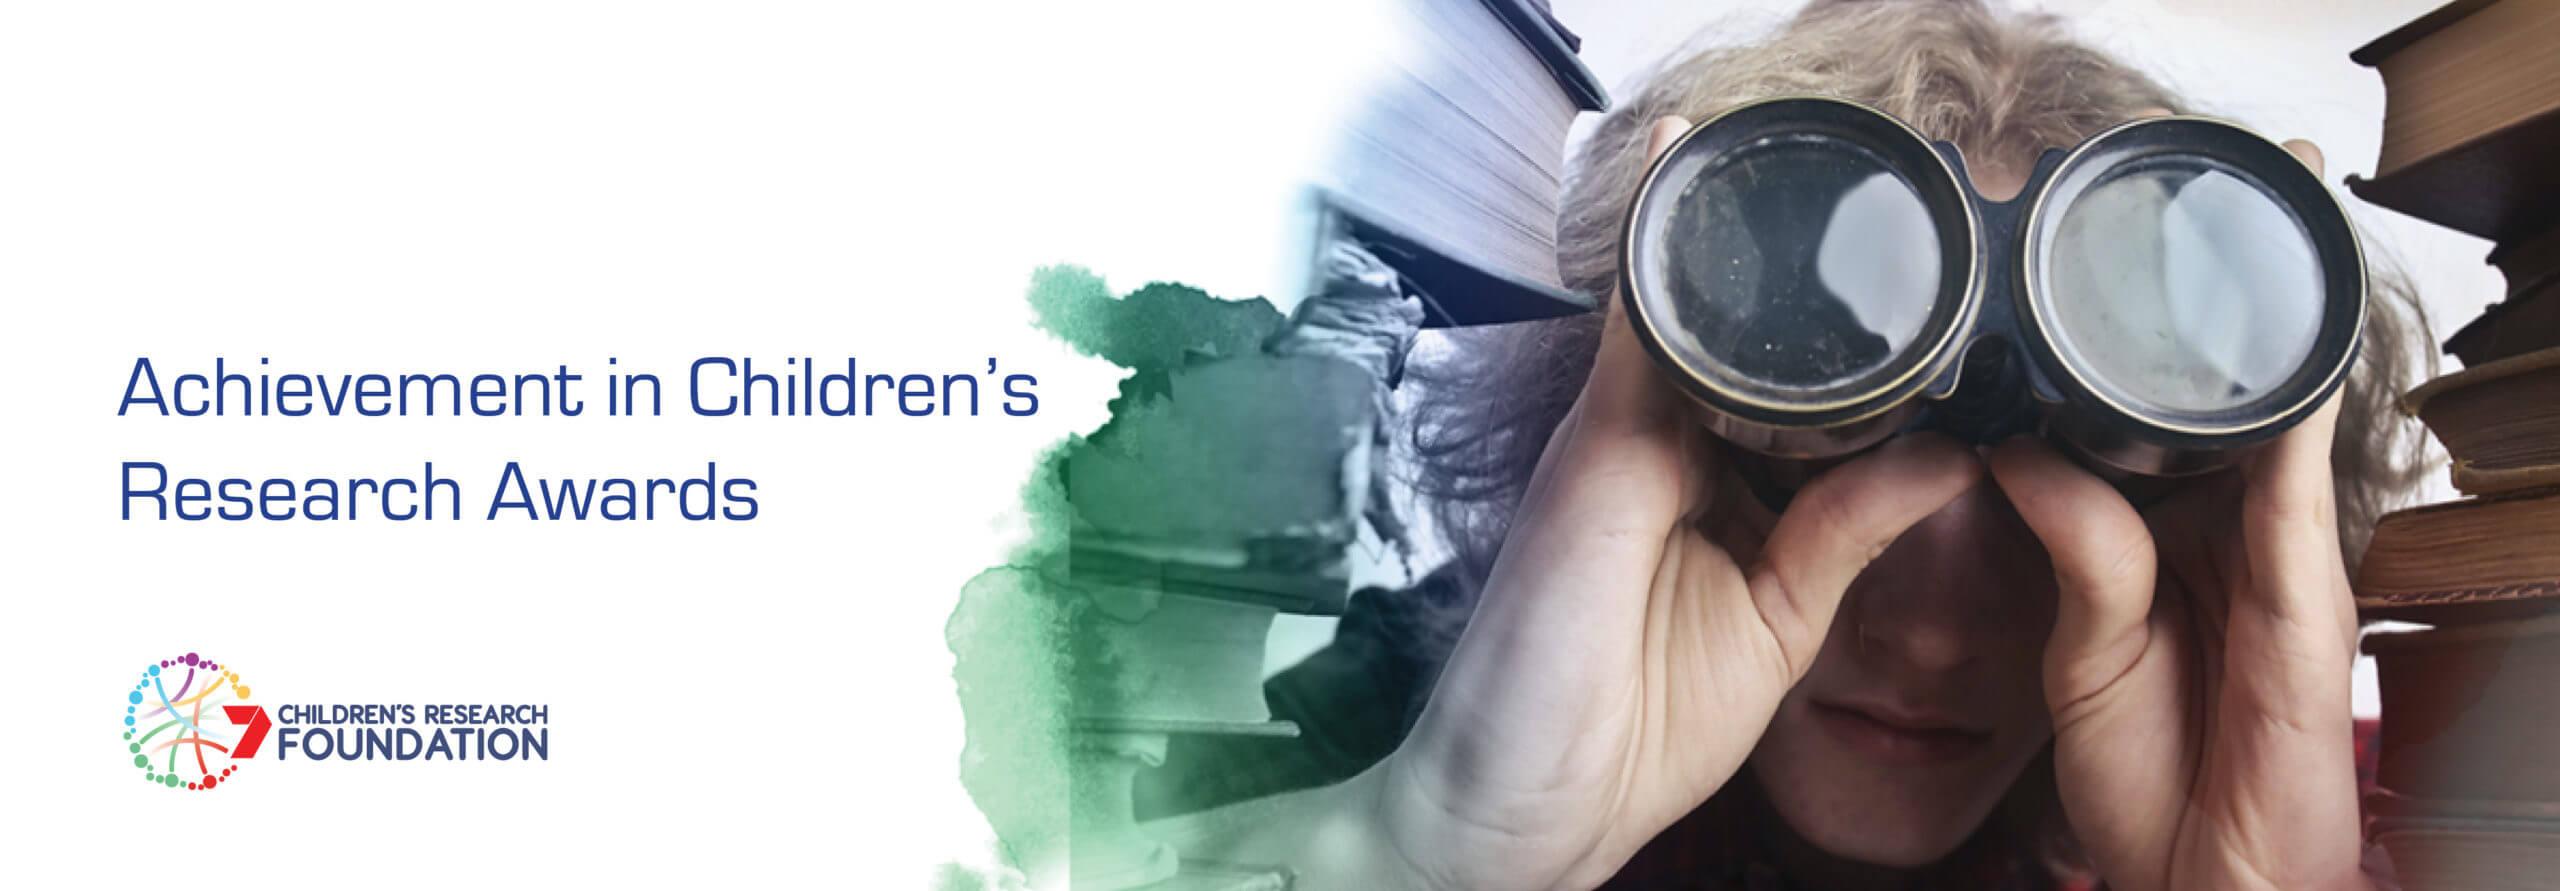 CRF ACHIEVEMENT IN CHILDREN'S RESEARCH AWARDS 2021